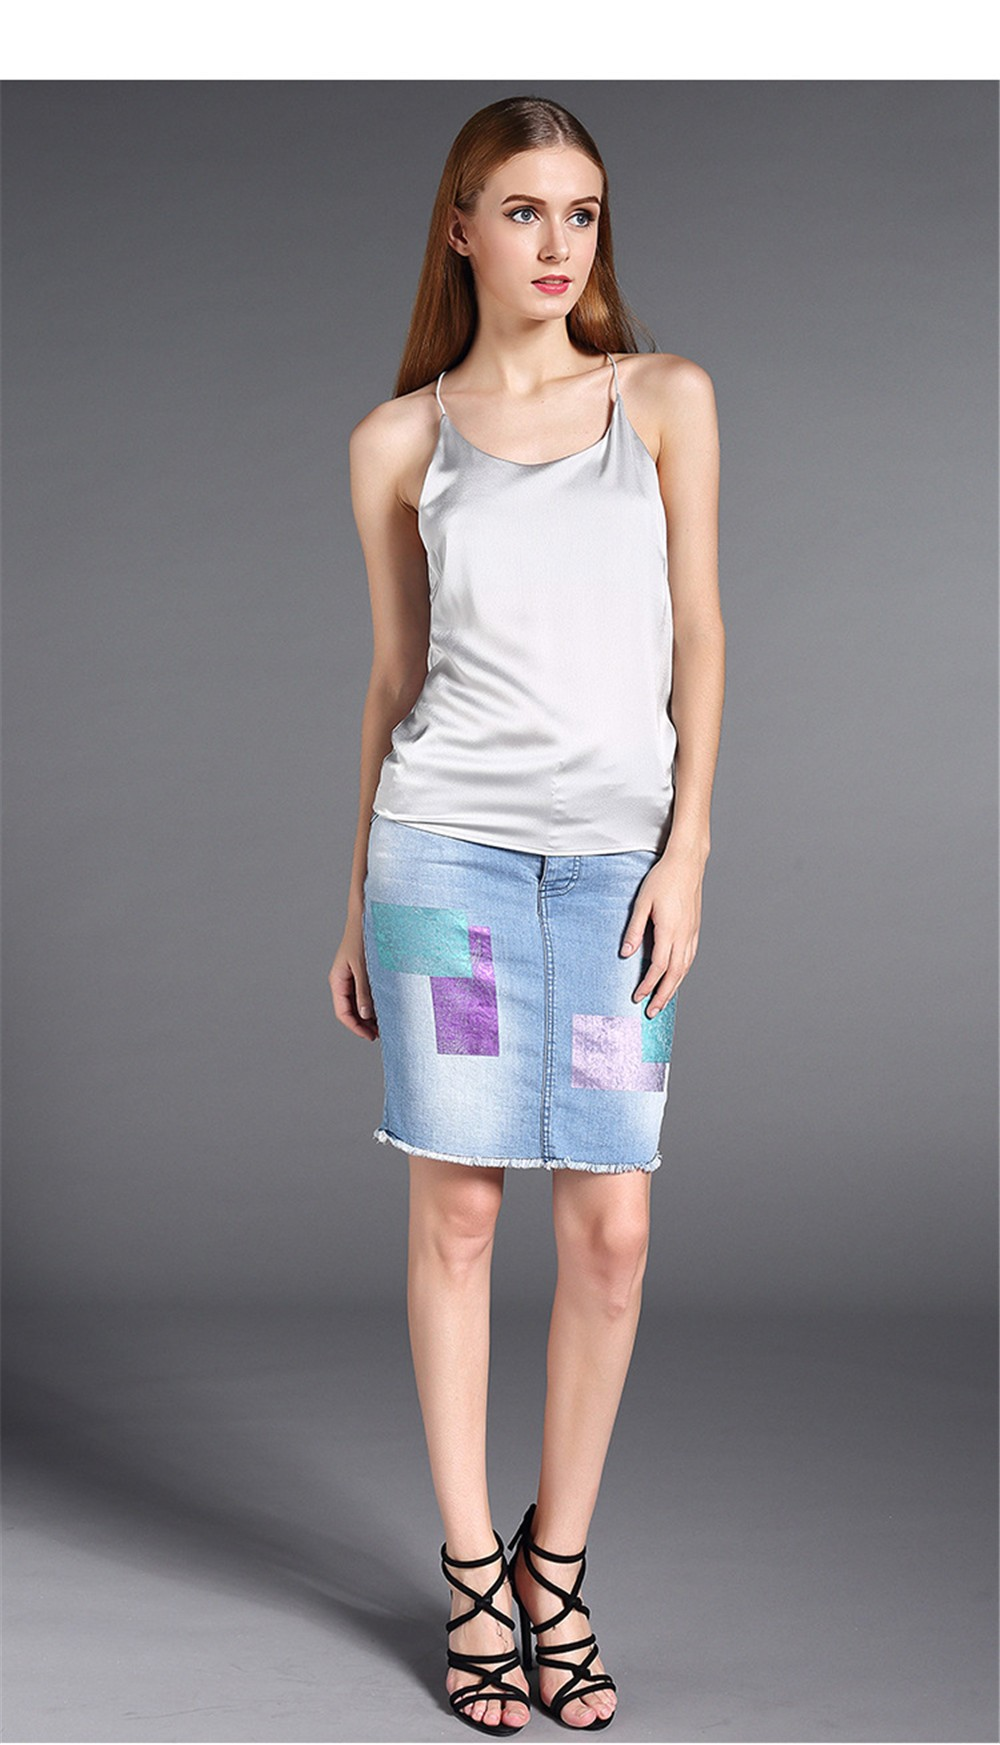 Plus Size S-4XL Multiple Women Tank Tops Brand Silk Blending Sleeveless Tshirt Women Female Shirt Smooth Blouse Blusas Femininas (16)